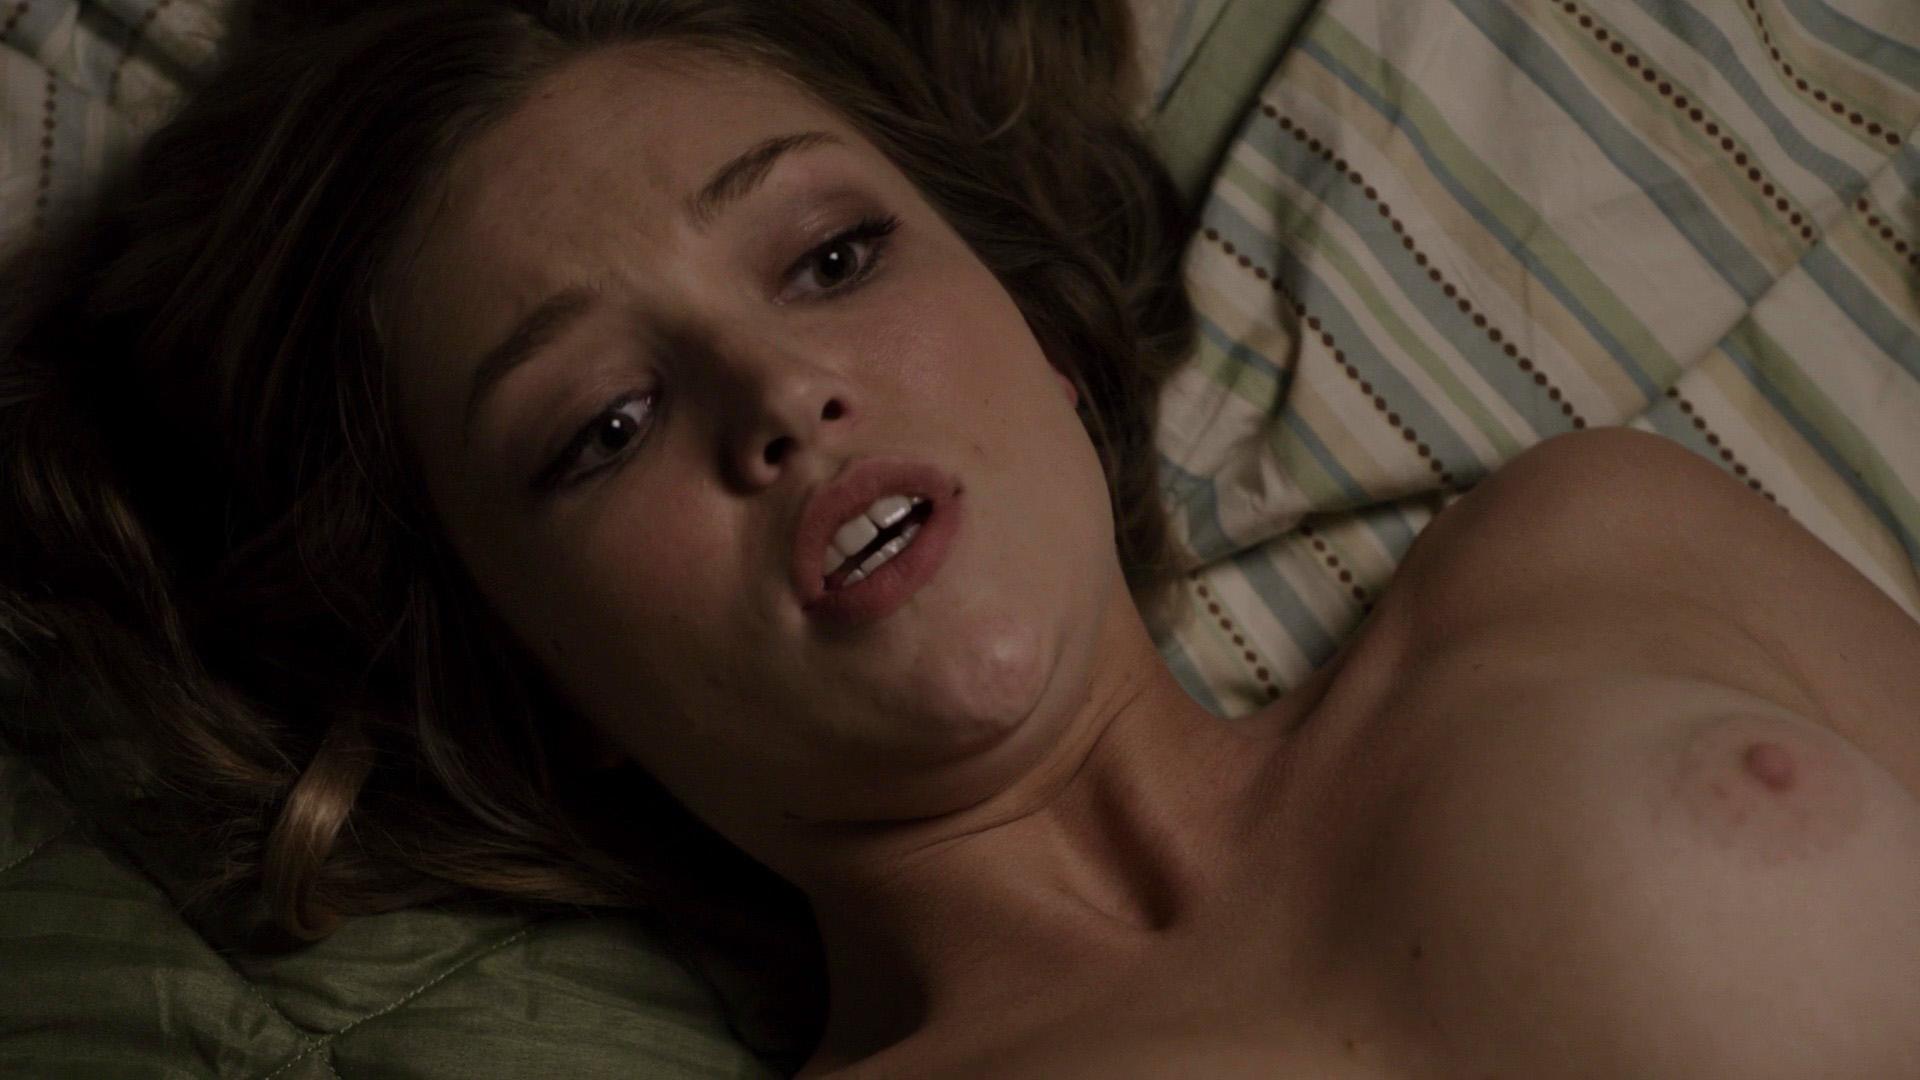 Lili Simmons, Trieste Kelly Dunn – Banshee s02e06 (2014) HD 1080p